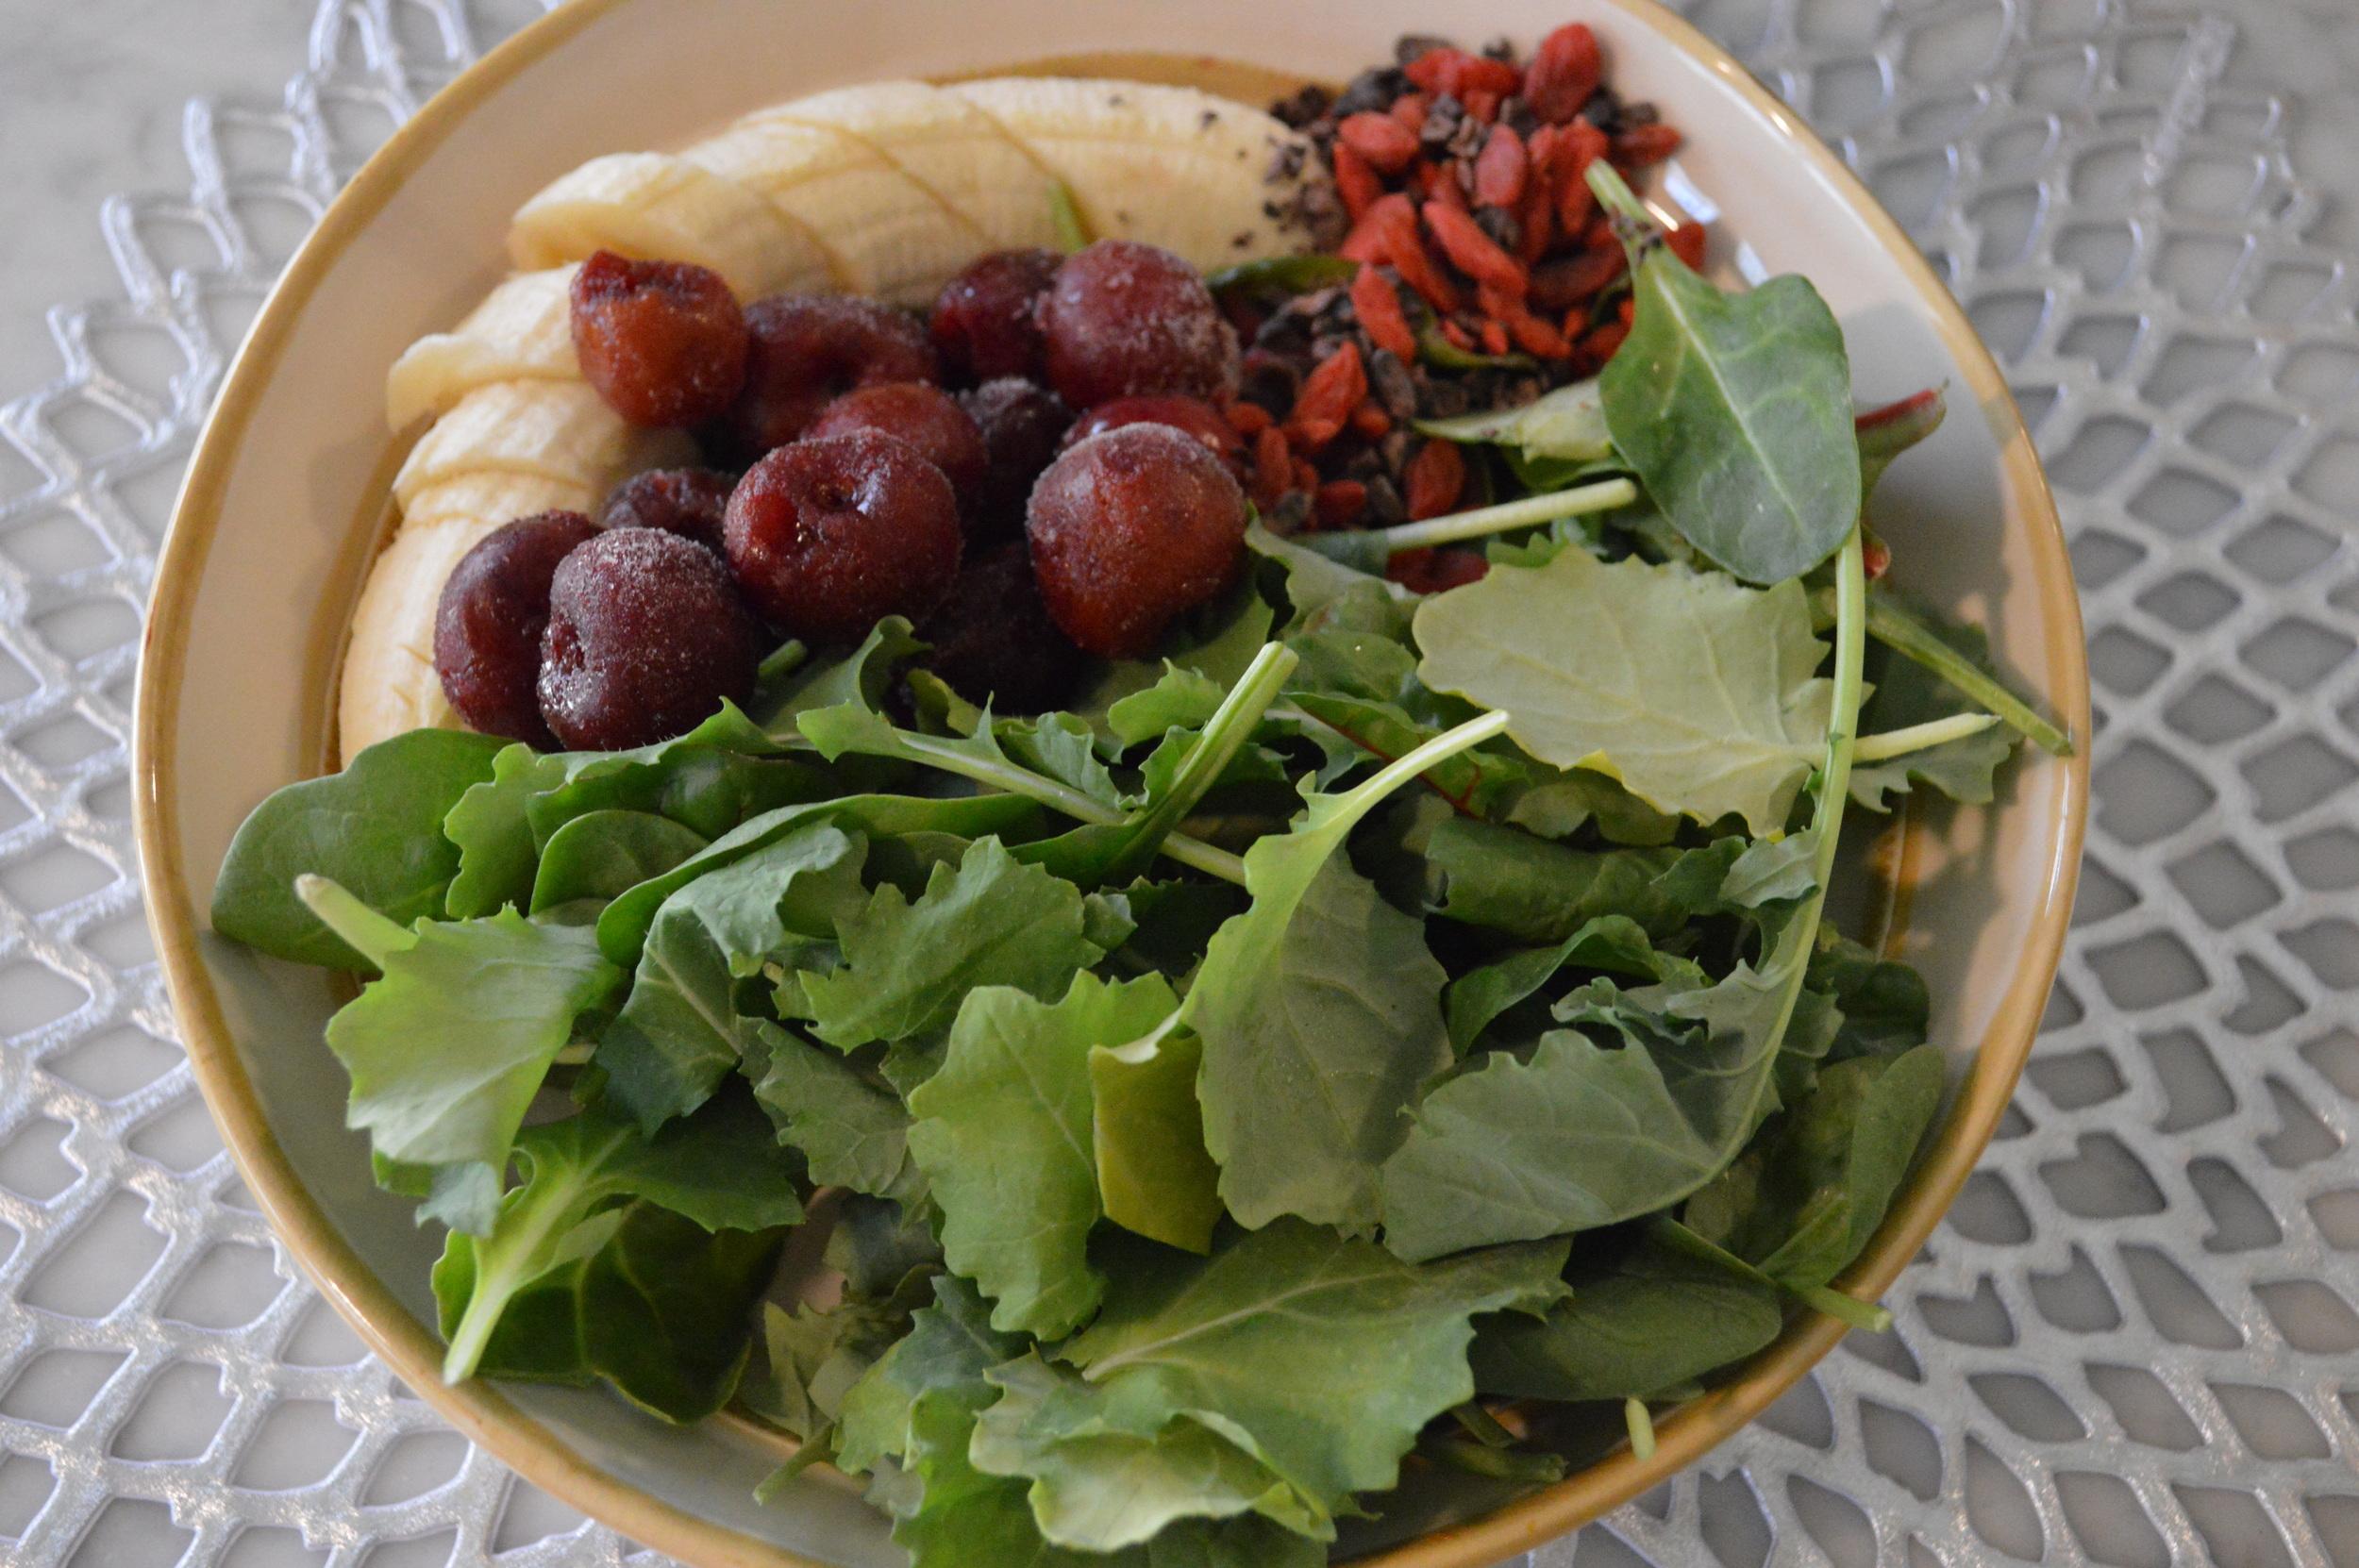 Dark Cherry Banana Green Smoothie - LaurenSchwaiger.com